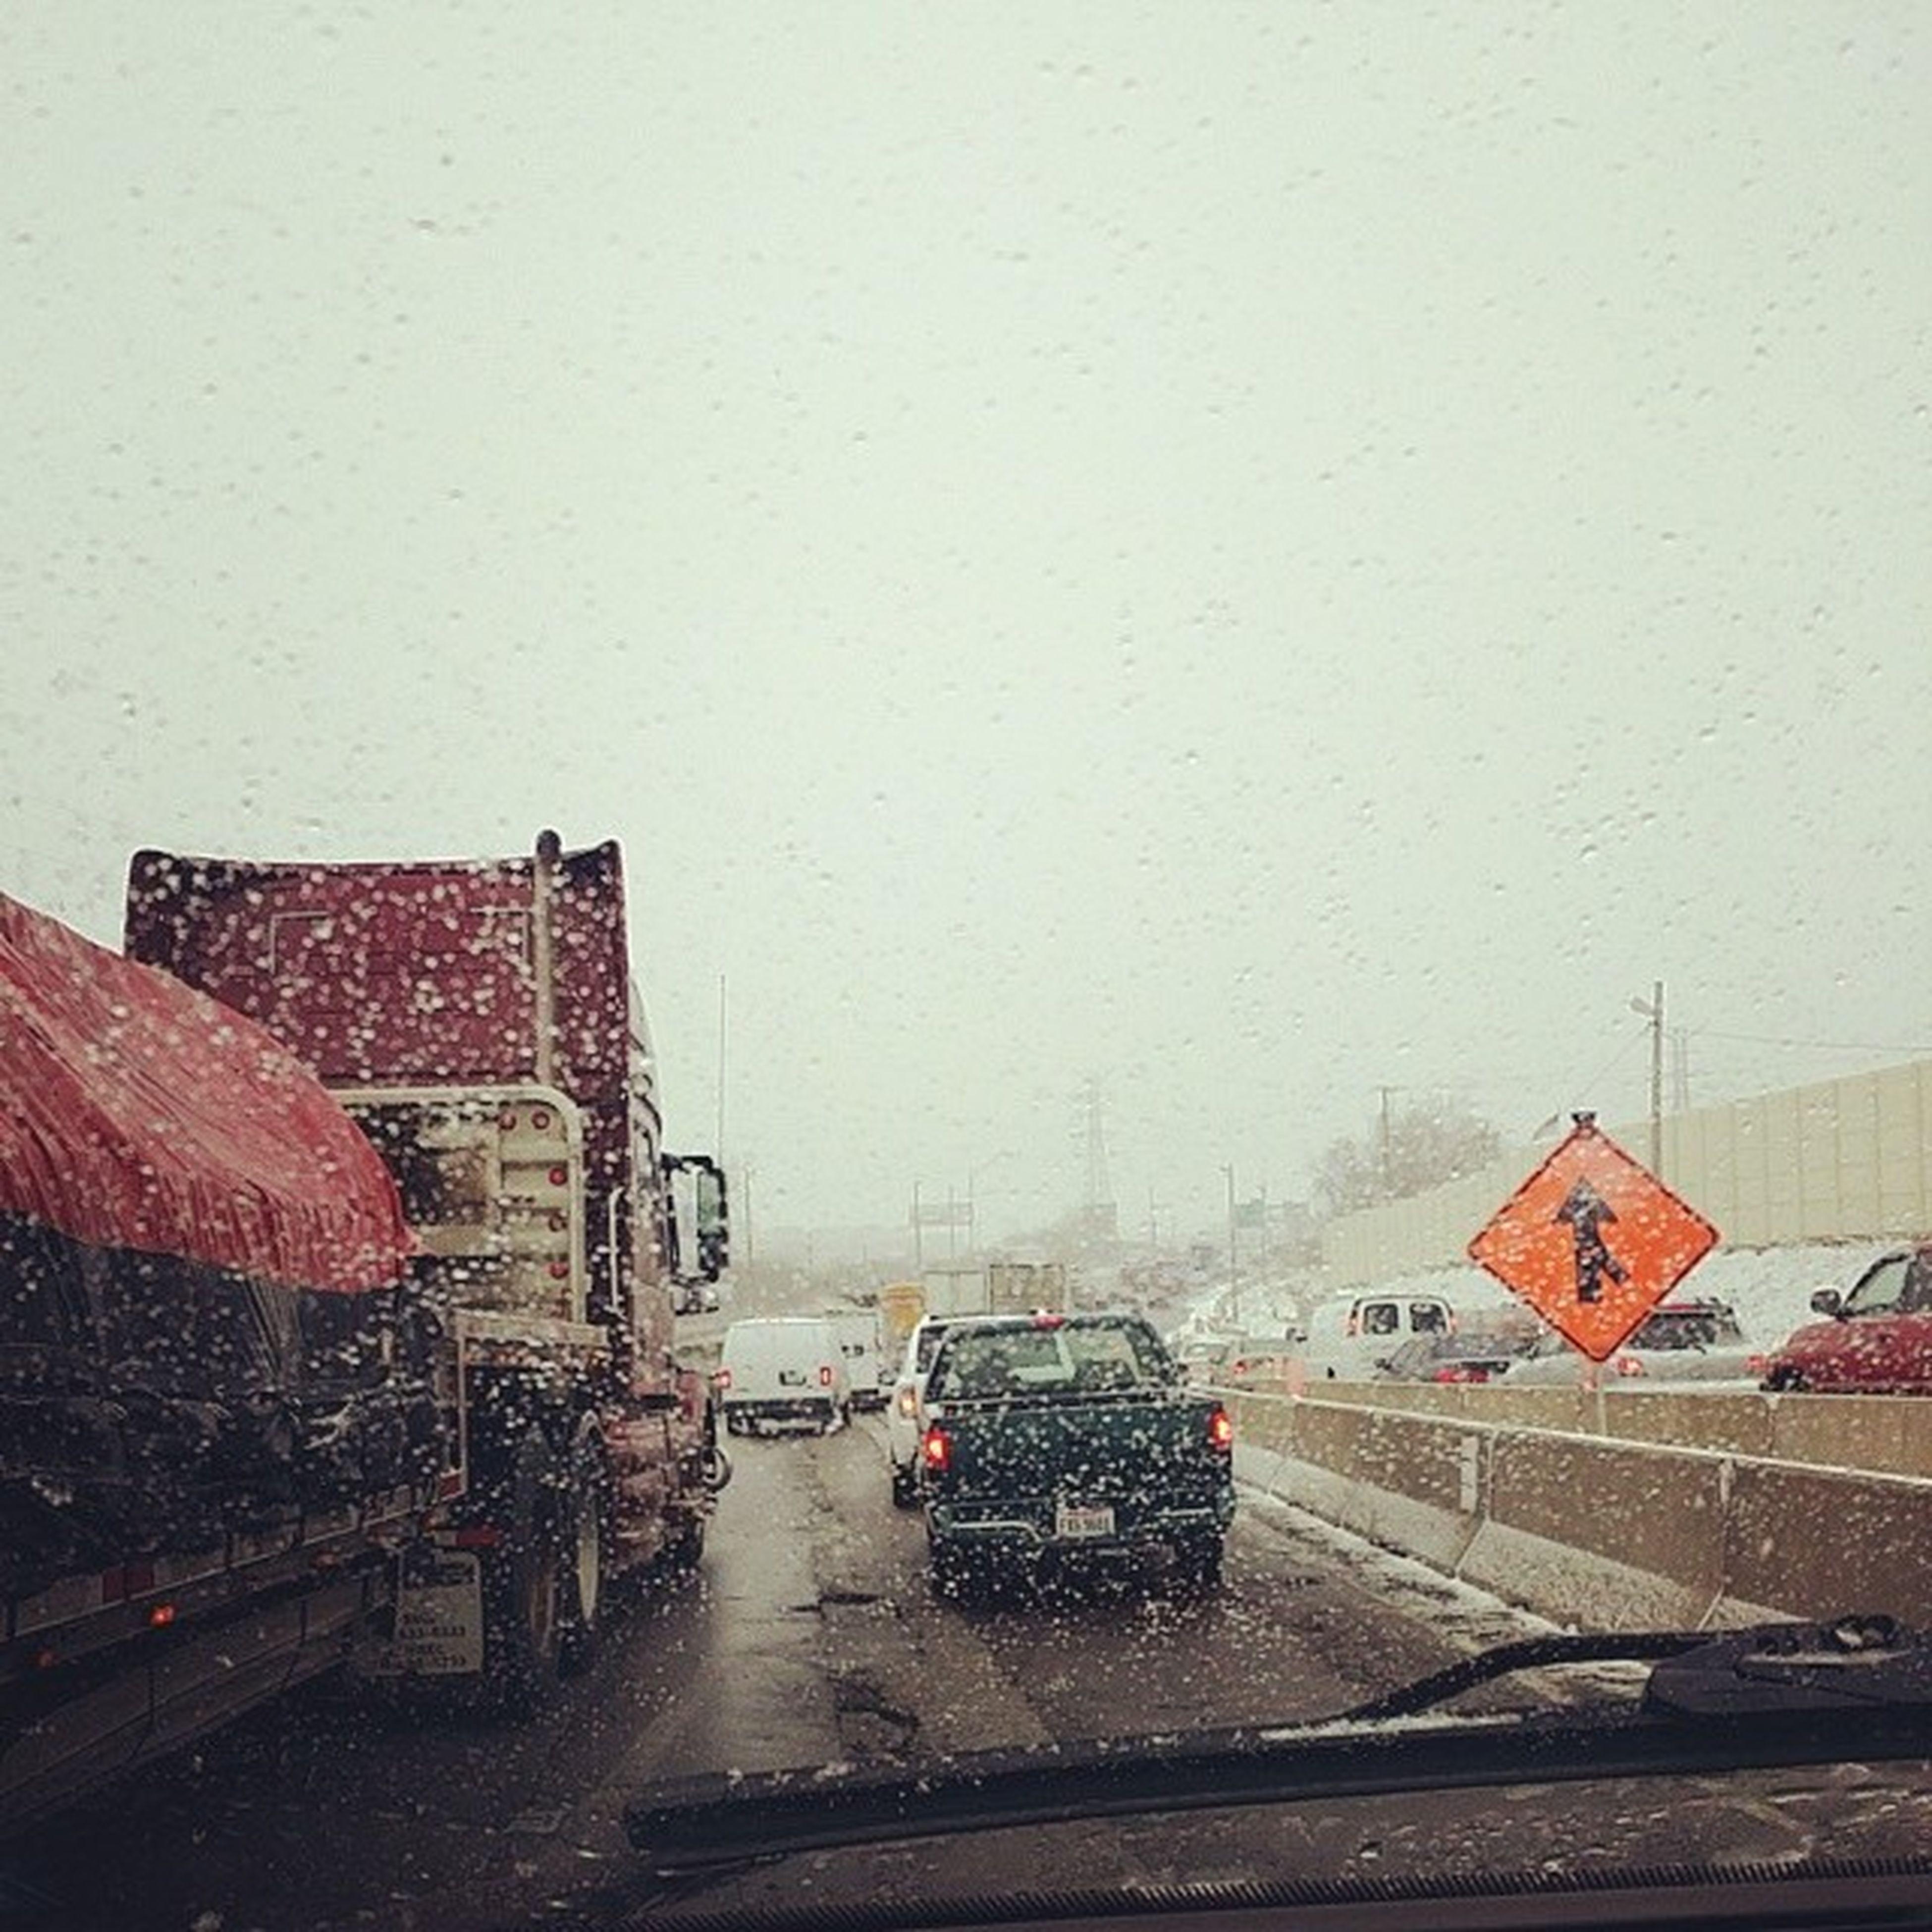 Trafficagedon 2014. Boo Winter Icyashell